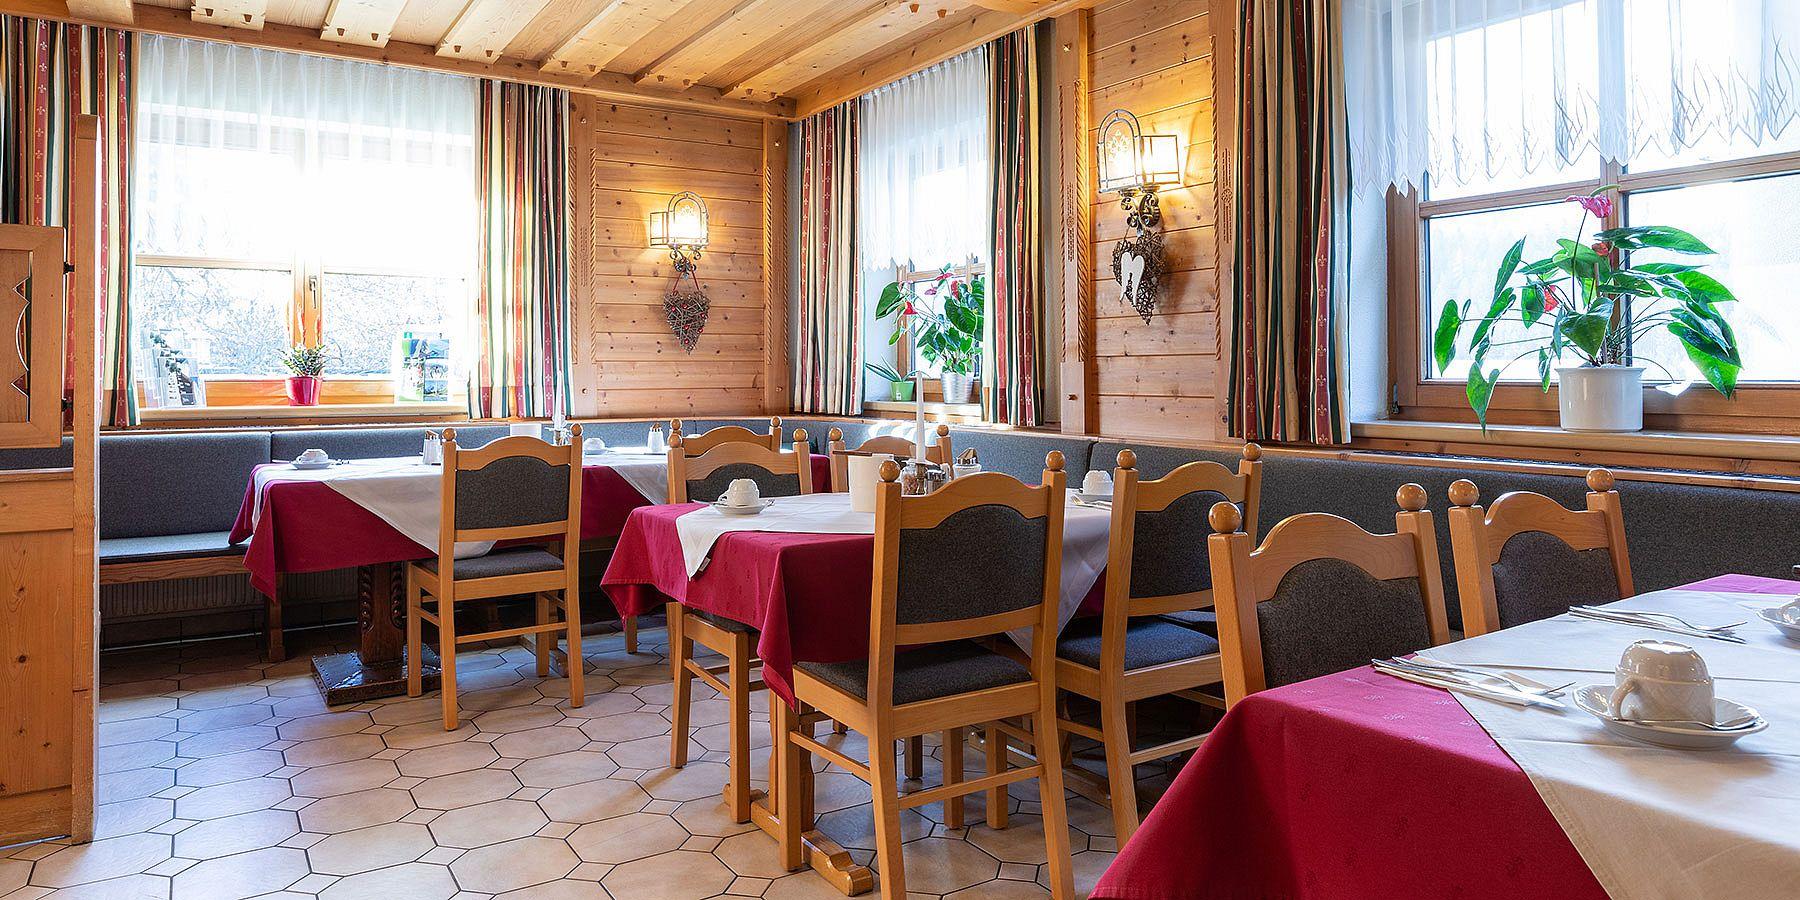 Halbpension Hotel Reiter